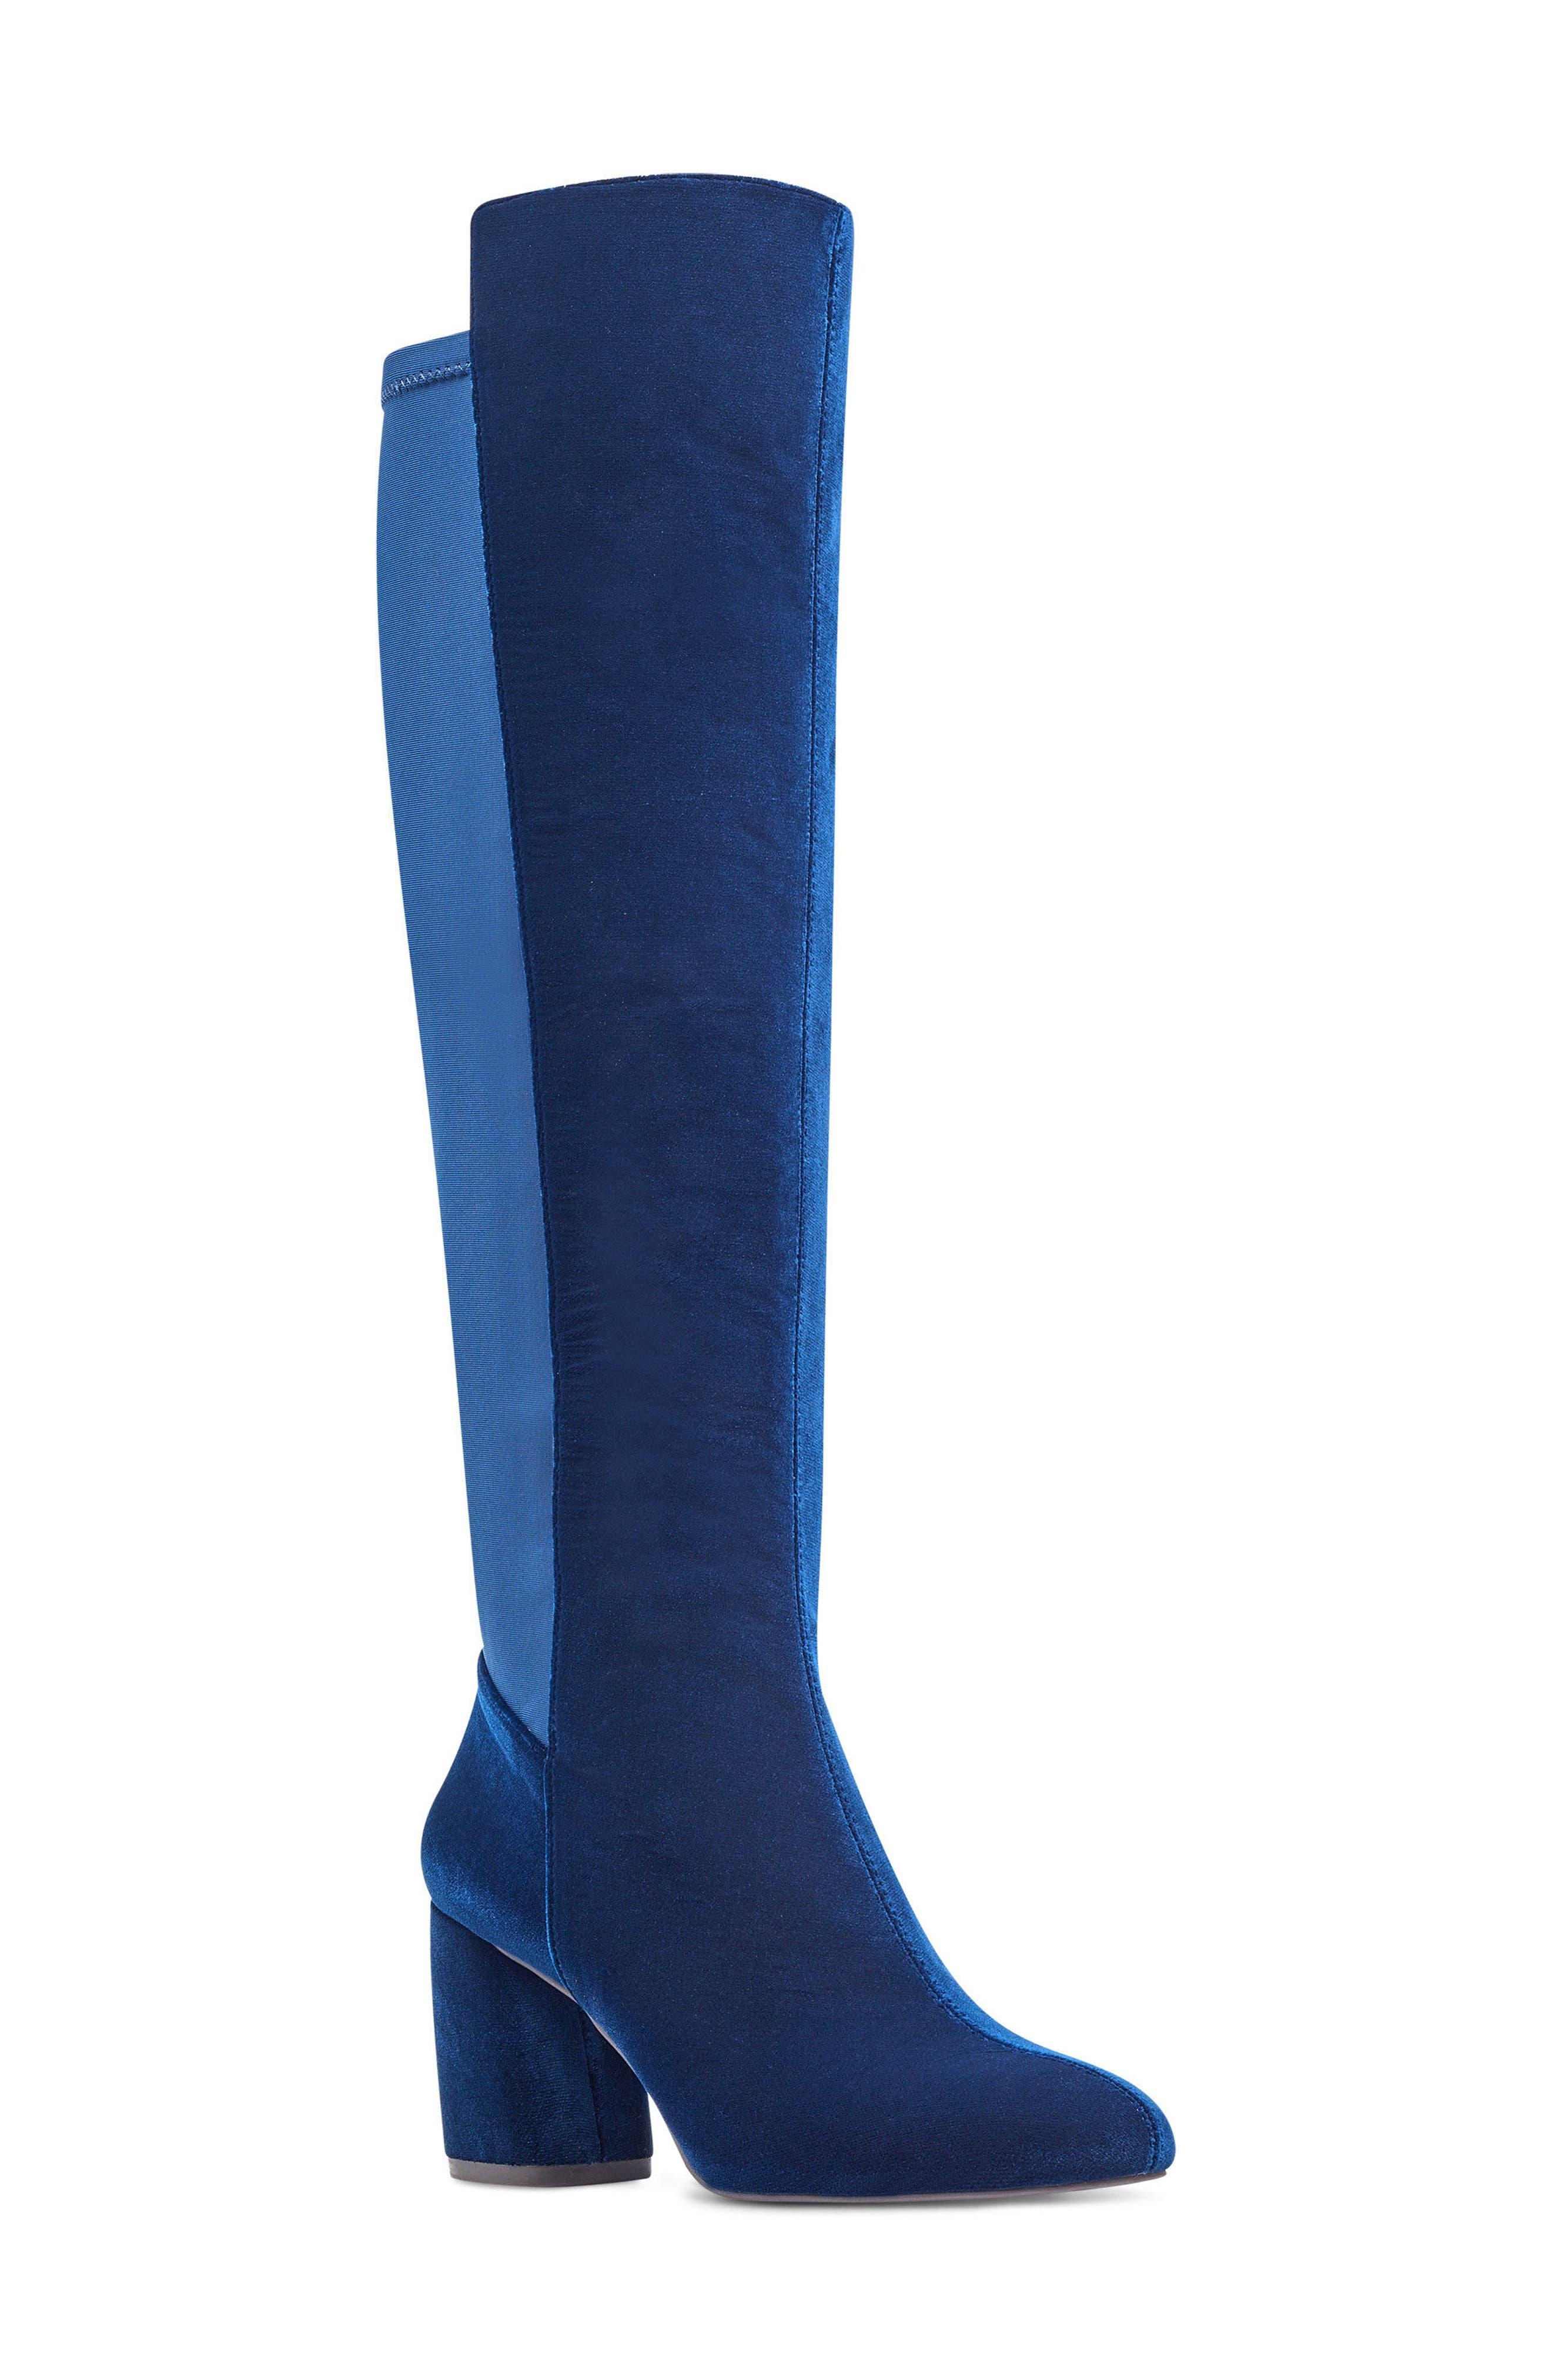 Kerianna Knee High Boot,                         Main,                         color, Navy Fabric